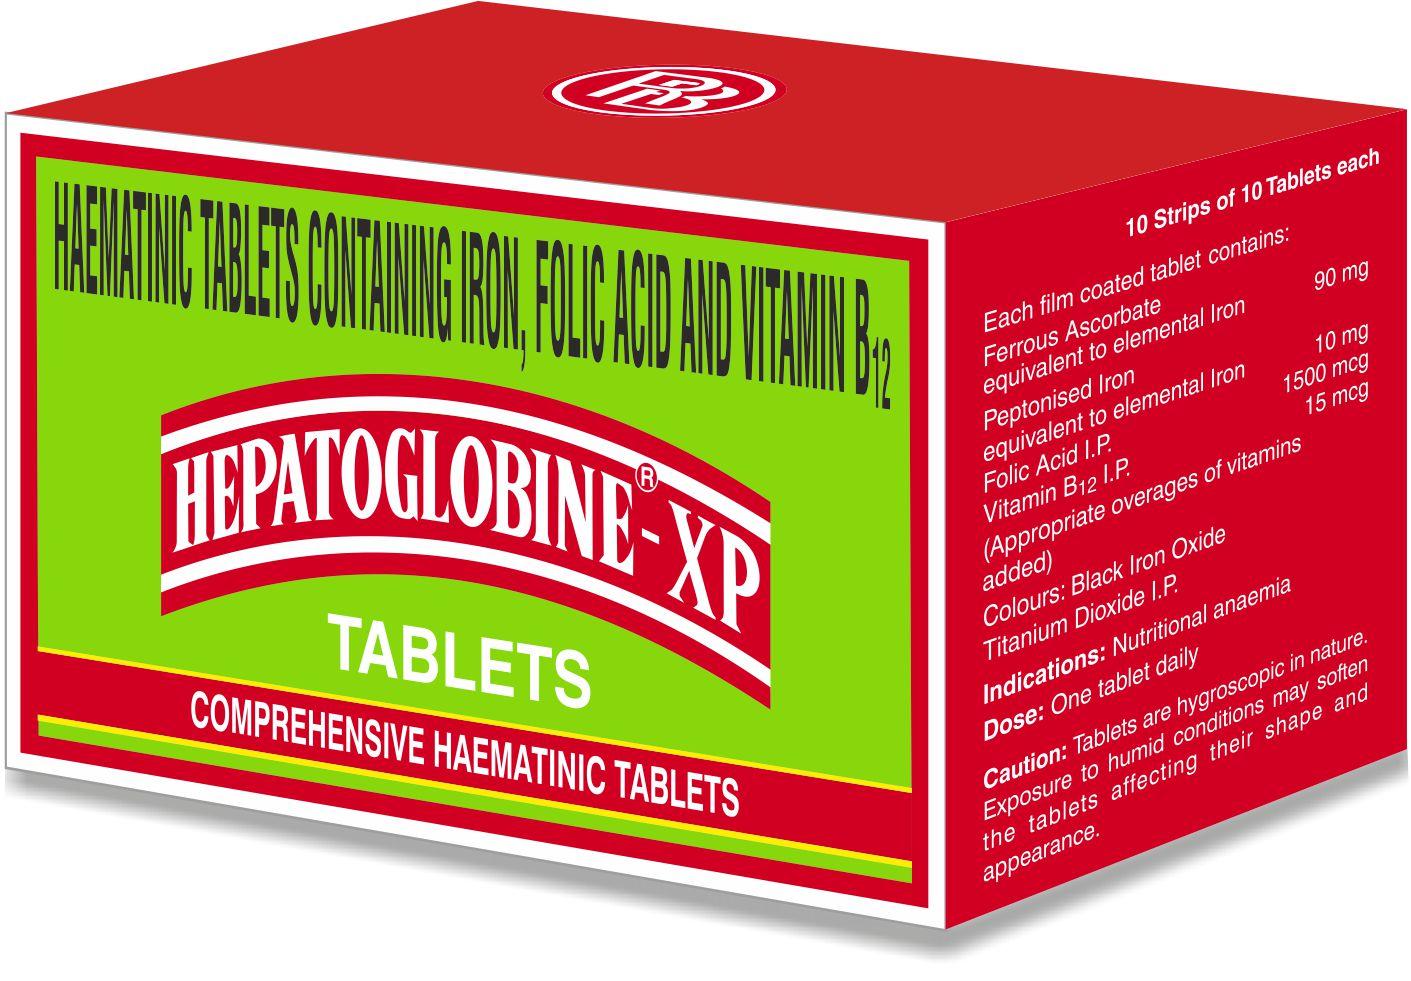 hepatoglobine_xp